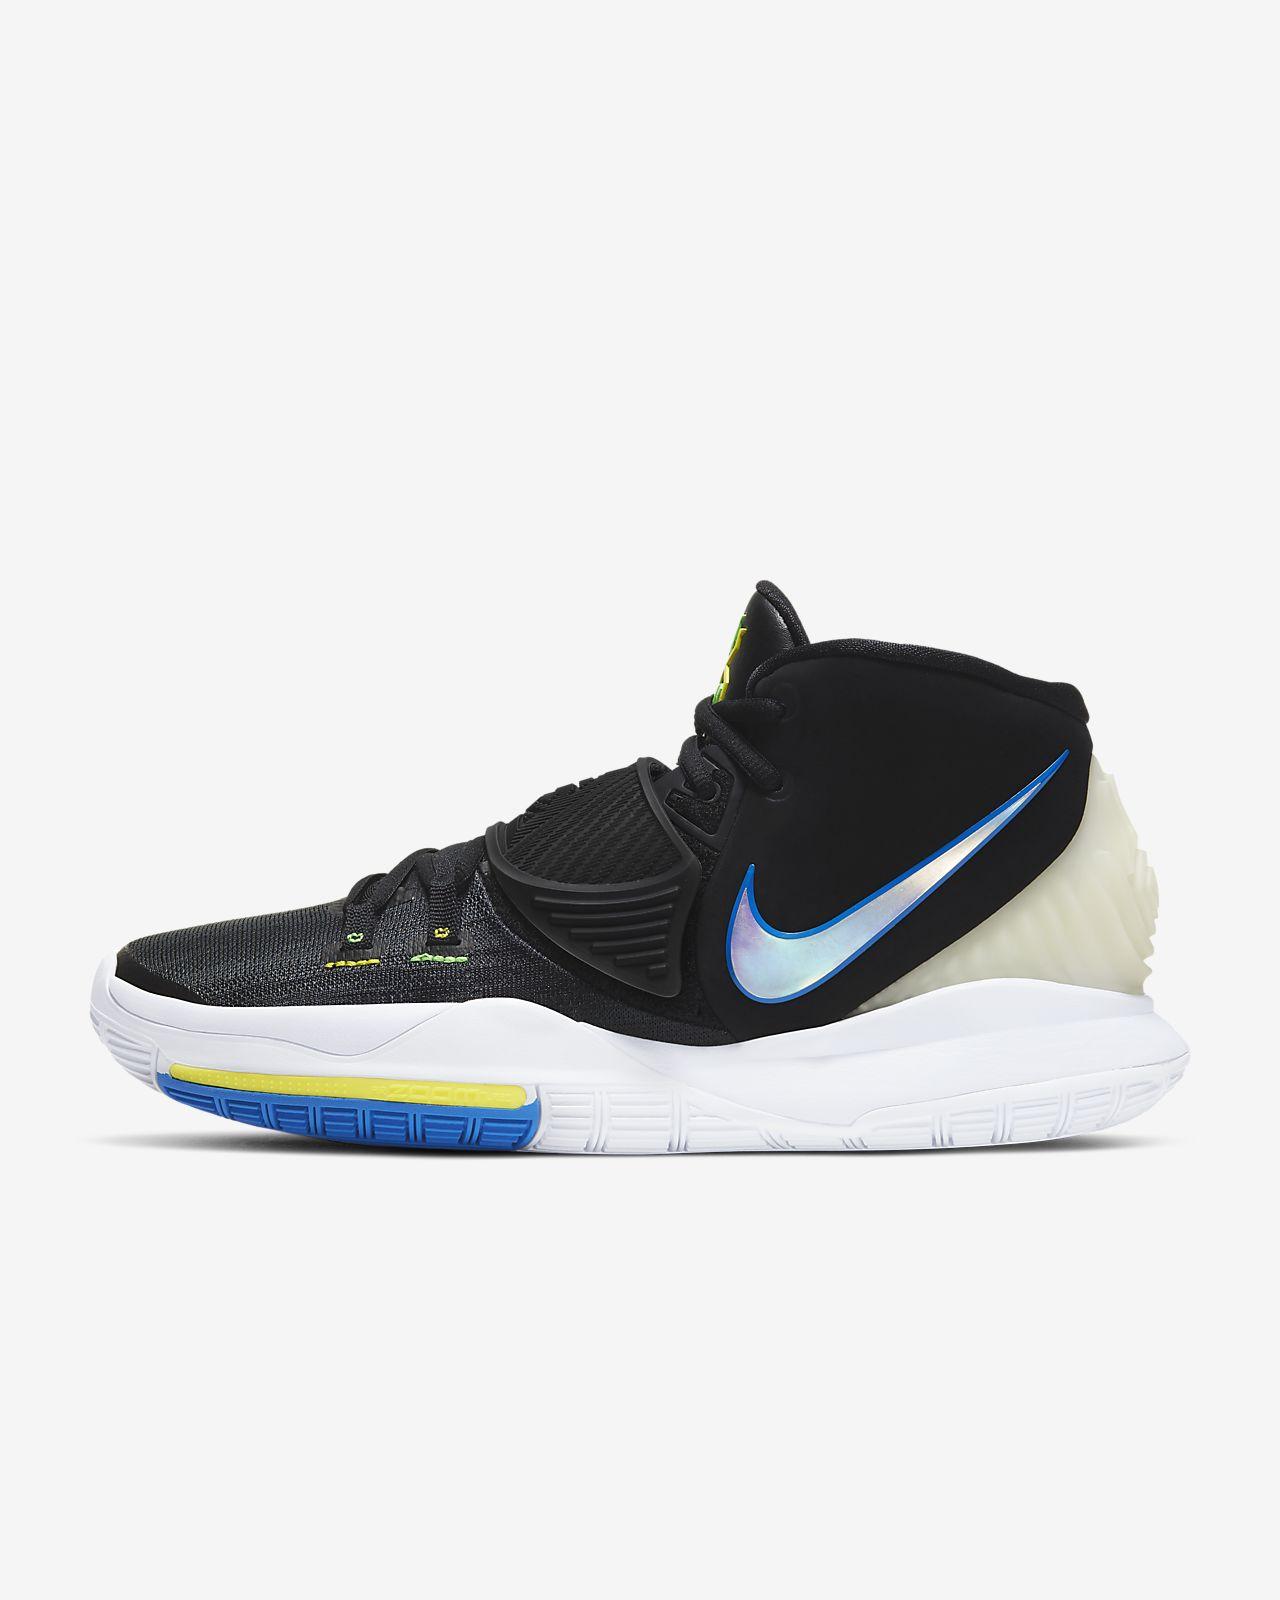 Kyrie 6 'Shutter Shades' Basketballschuh